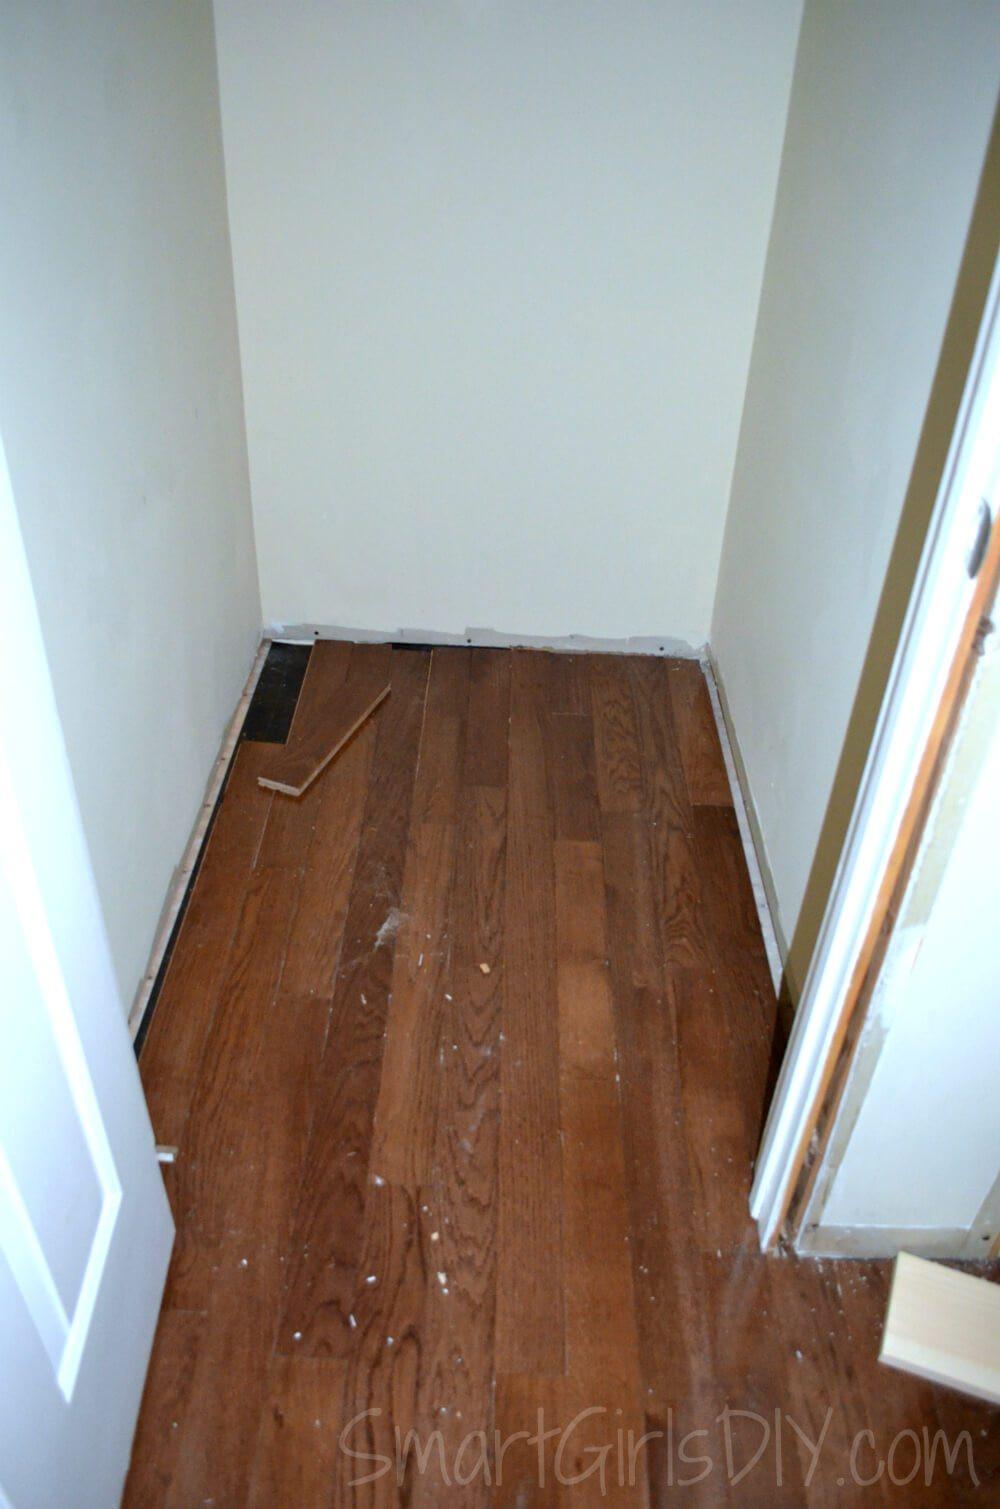 paper underlayment for hardwood floors of upstairs hallway 1 installing hardwood floors inside hardwood extends into closet